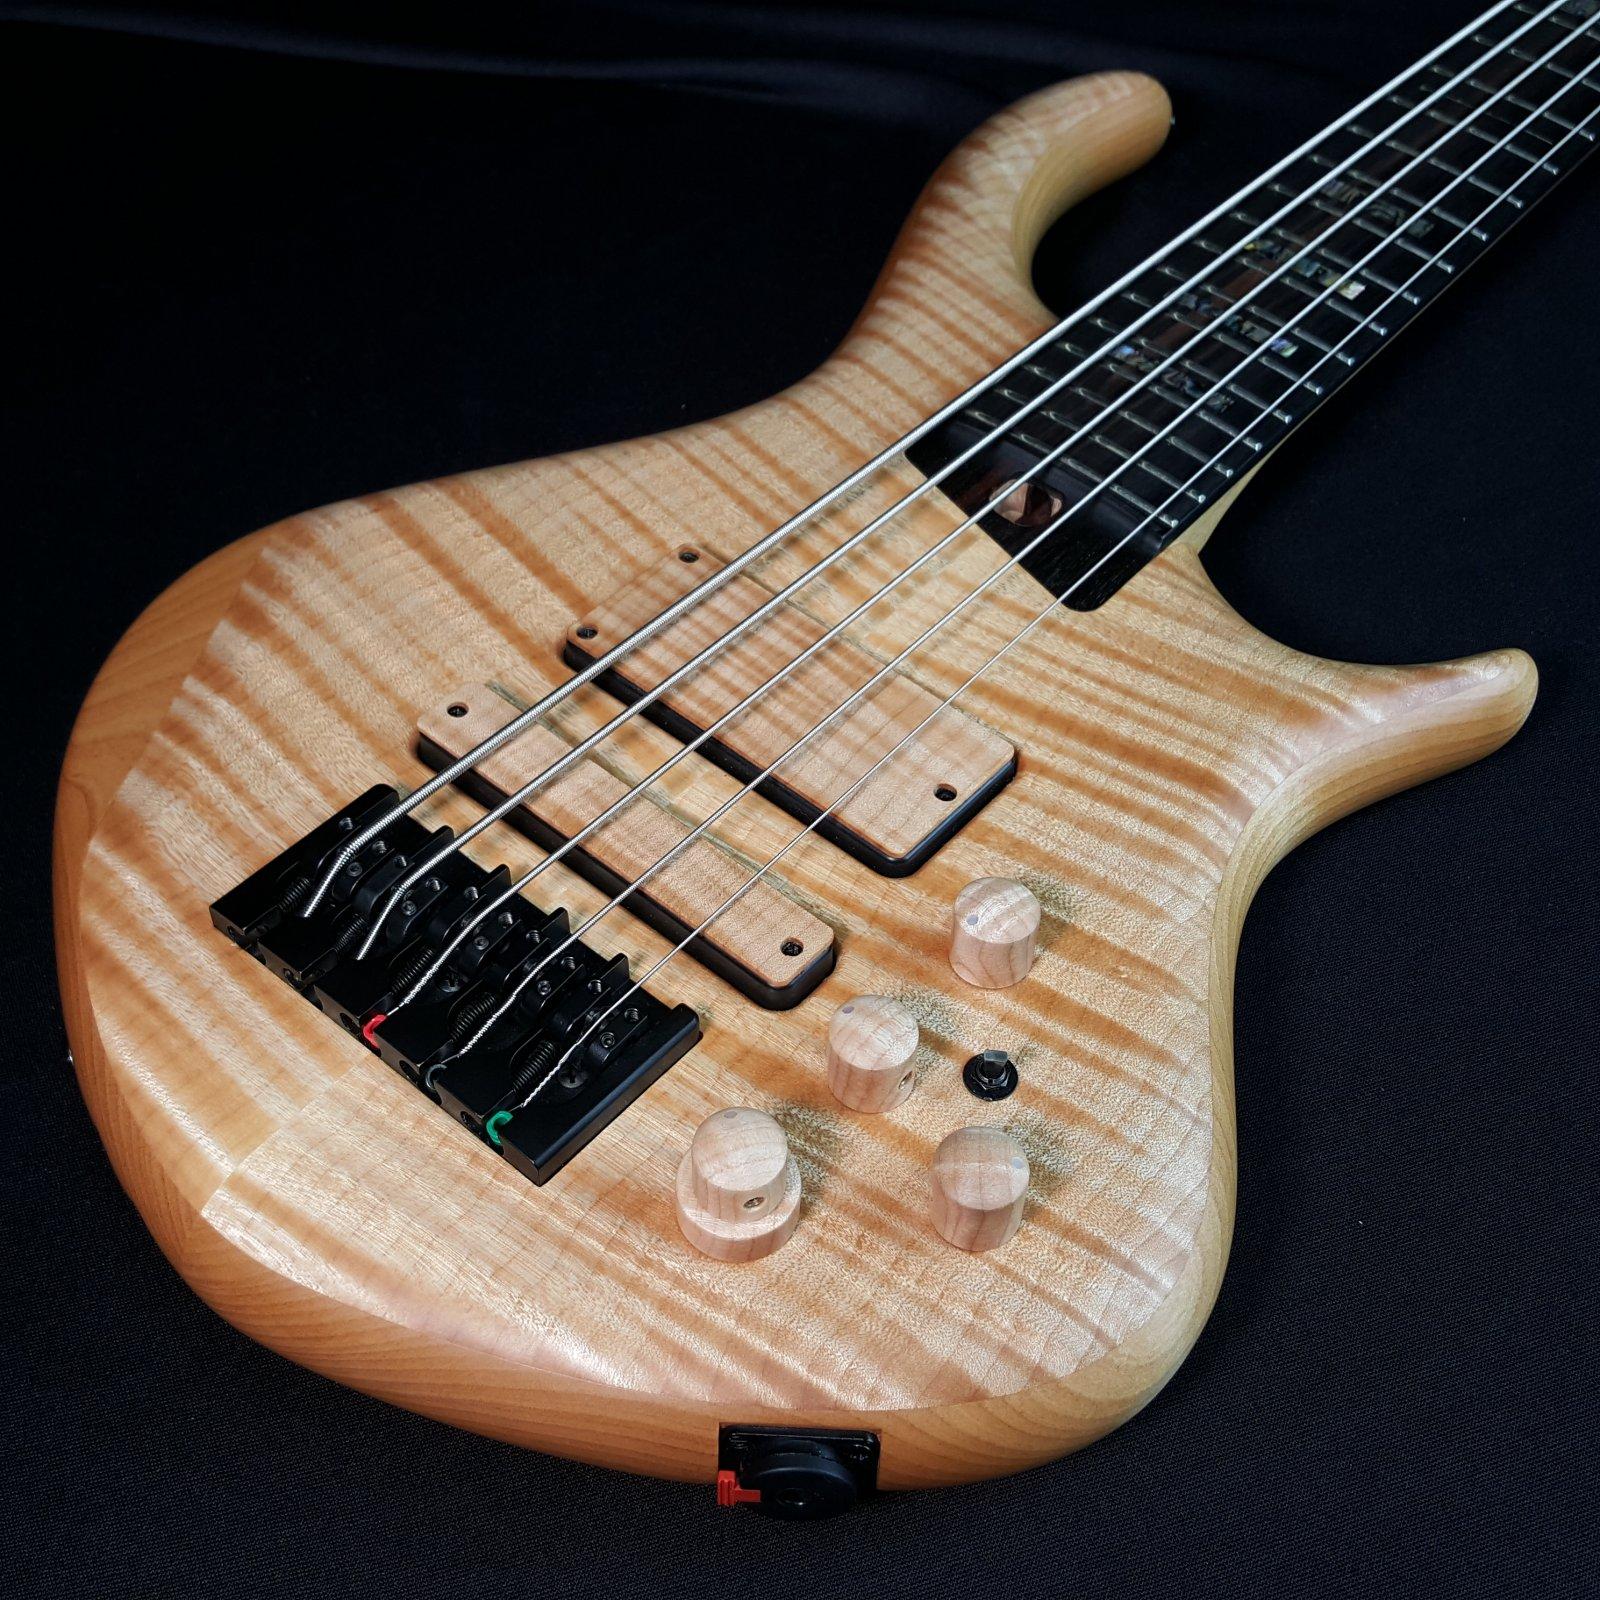 Used Warrior Dran Michael 2018 5 String Bass w/Mooradian Gig Bag 8lb 10oz